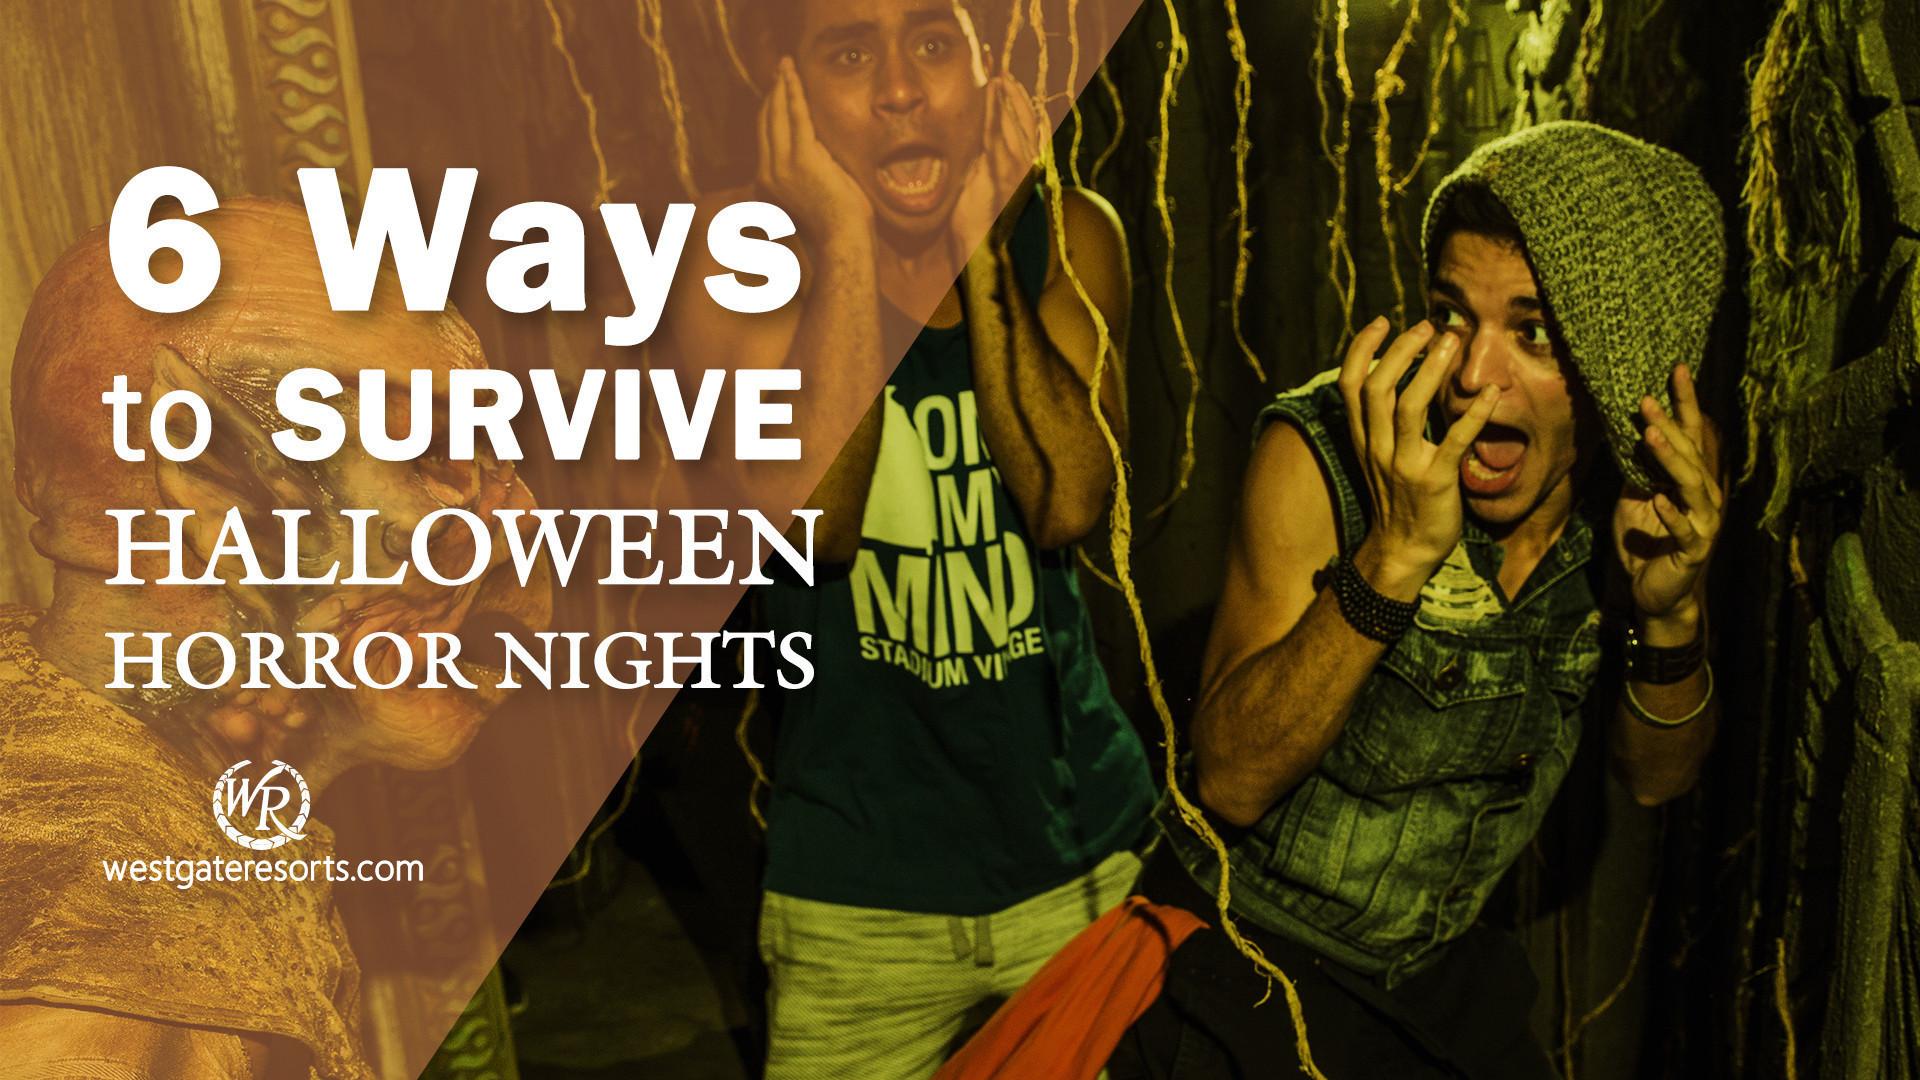 6 Ways to Survive Halloween Horror Nights Wait Times in Orlando for 2018   Westgate Resorts